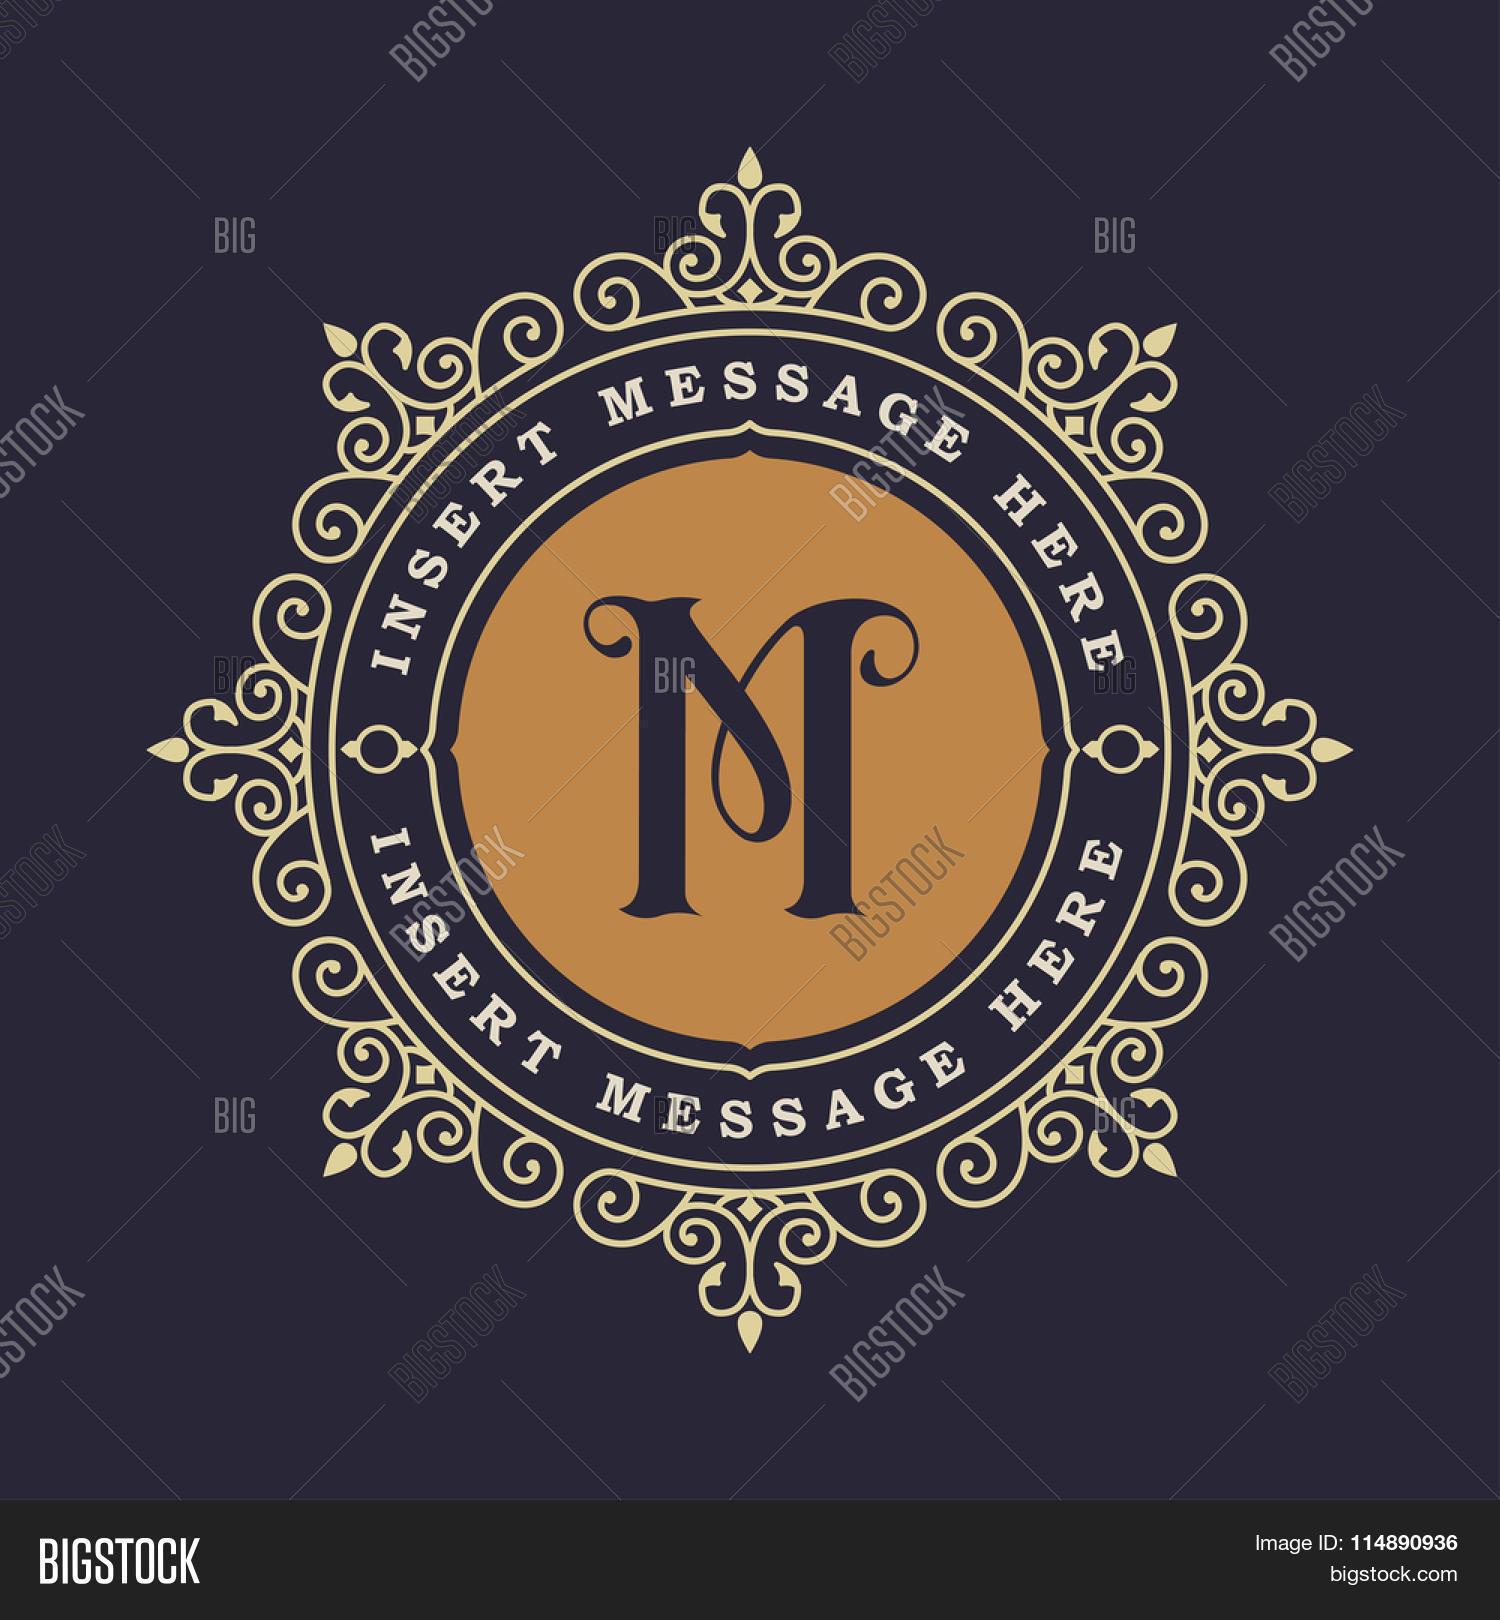 Monogram Emblem Vector & Photo (Free Trial) | Bigstock